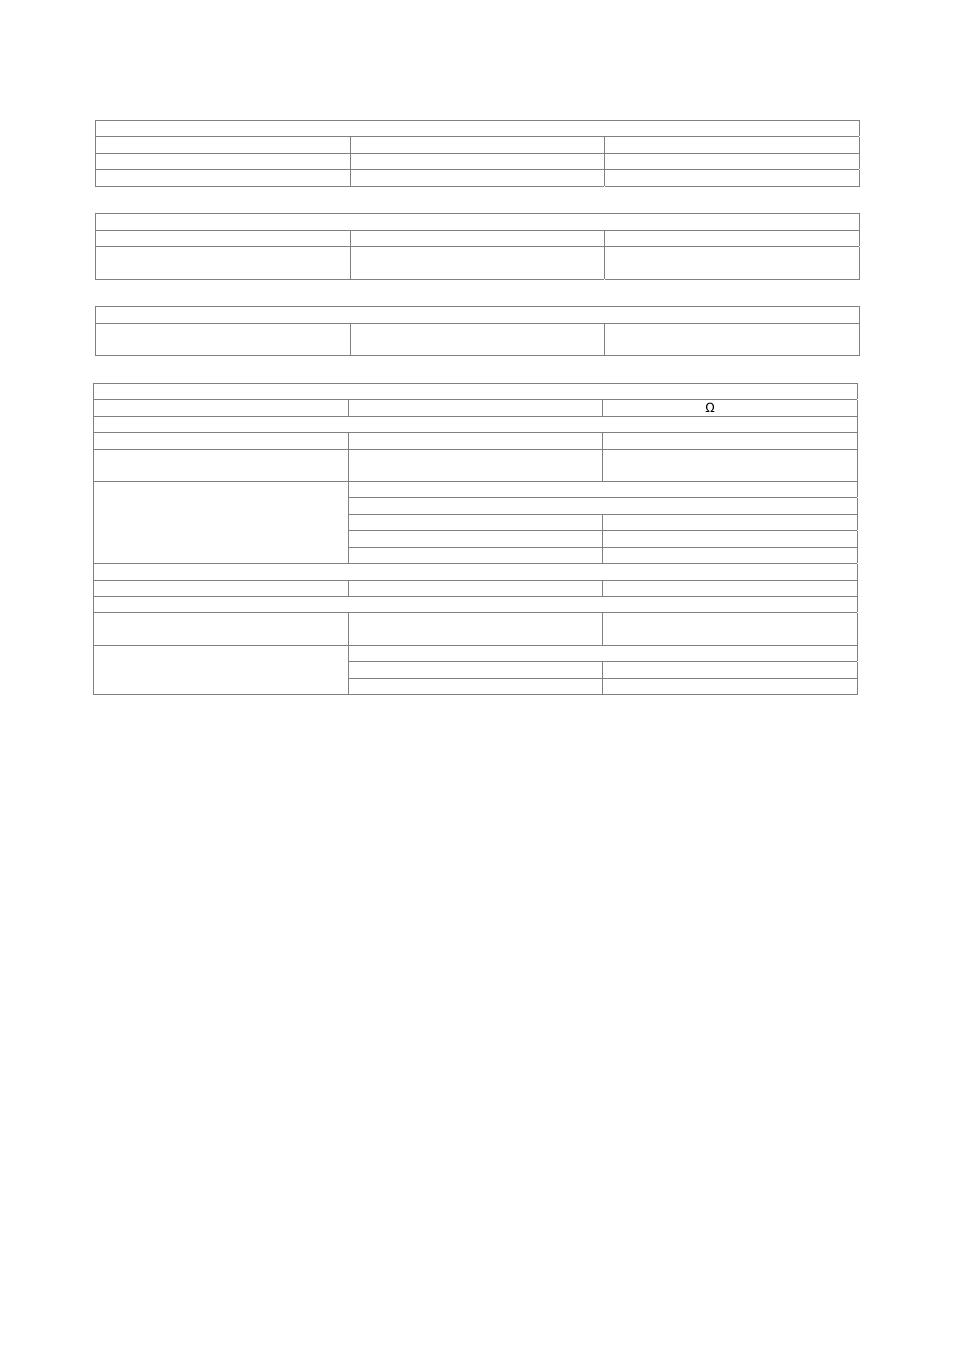 Fsl-b5 additional interfaces | Atec Rohde-Schwarz_FSL Series